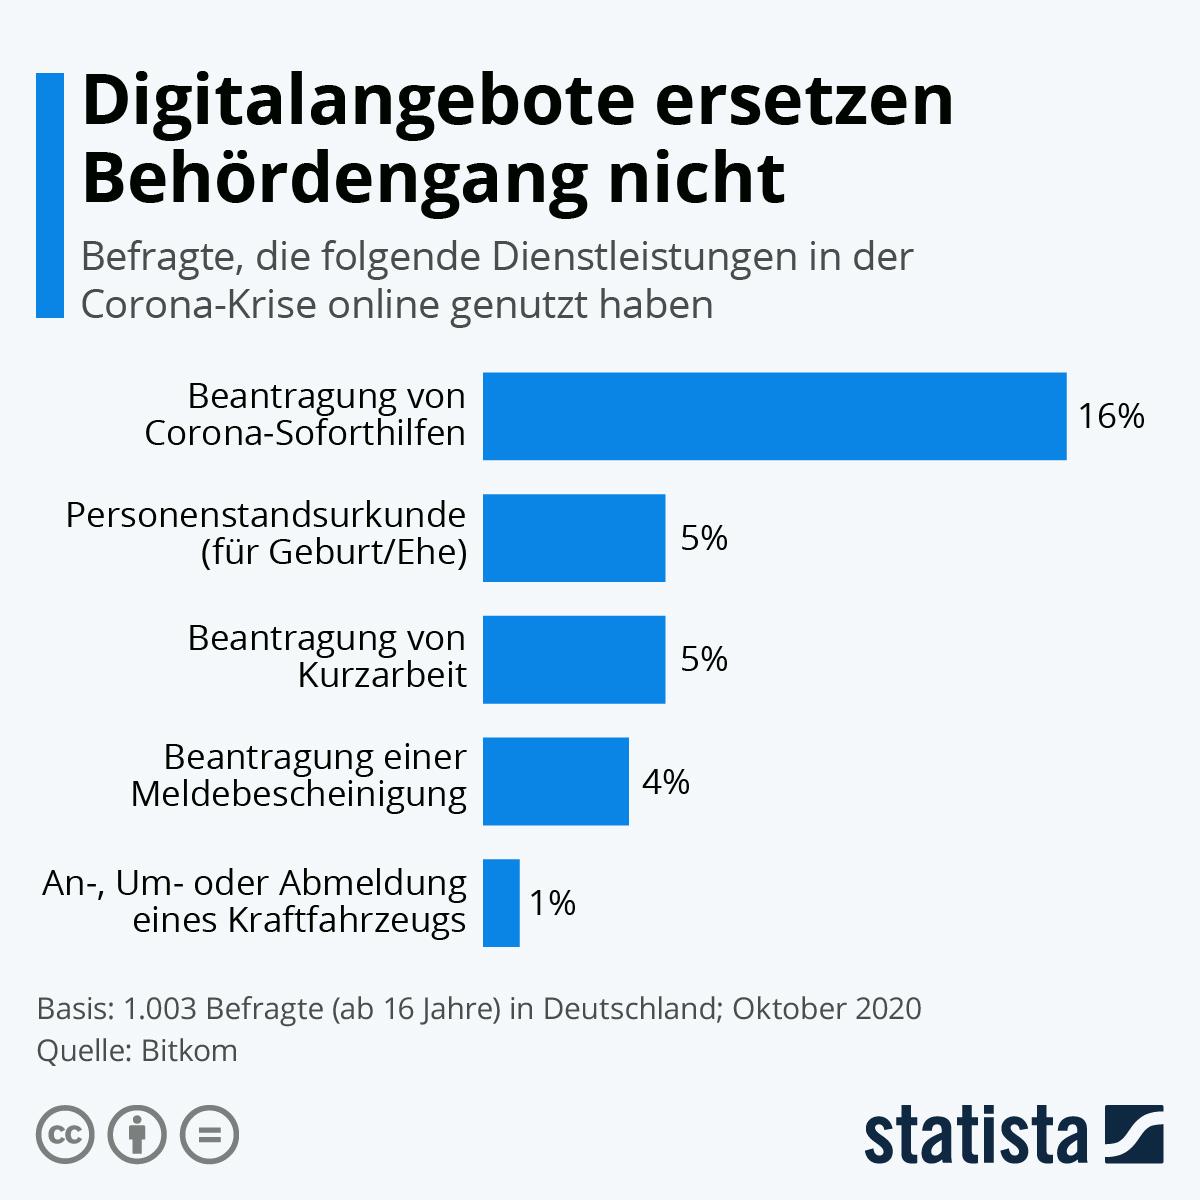 Infografik: Digitalangebote ersetzen Behördengang nicht | Statista